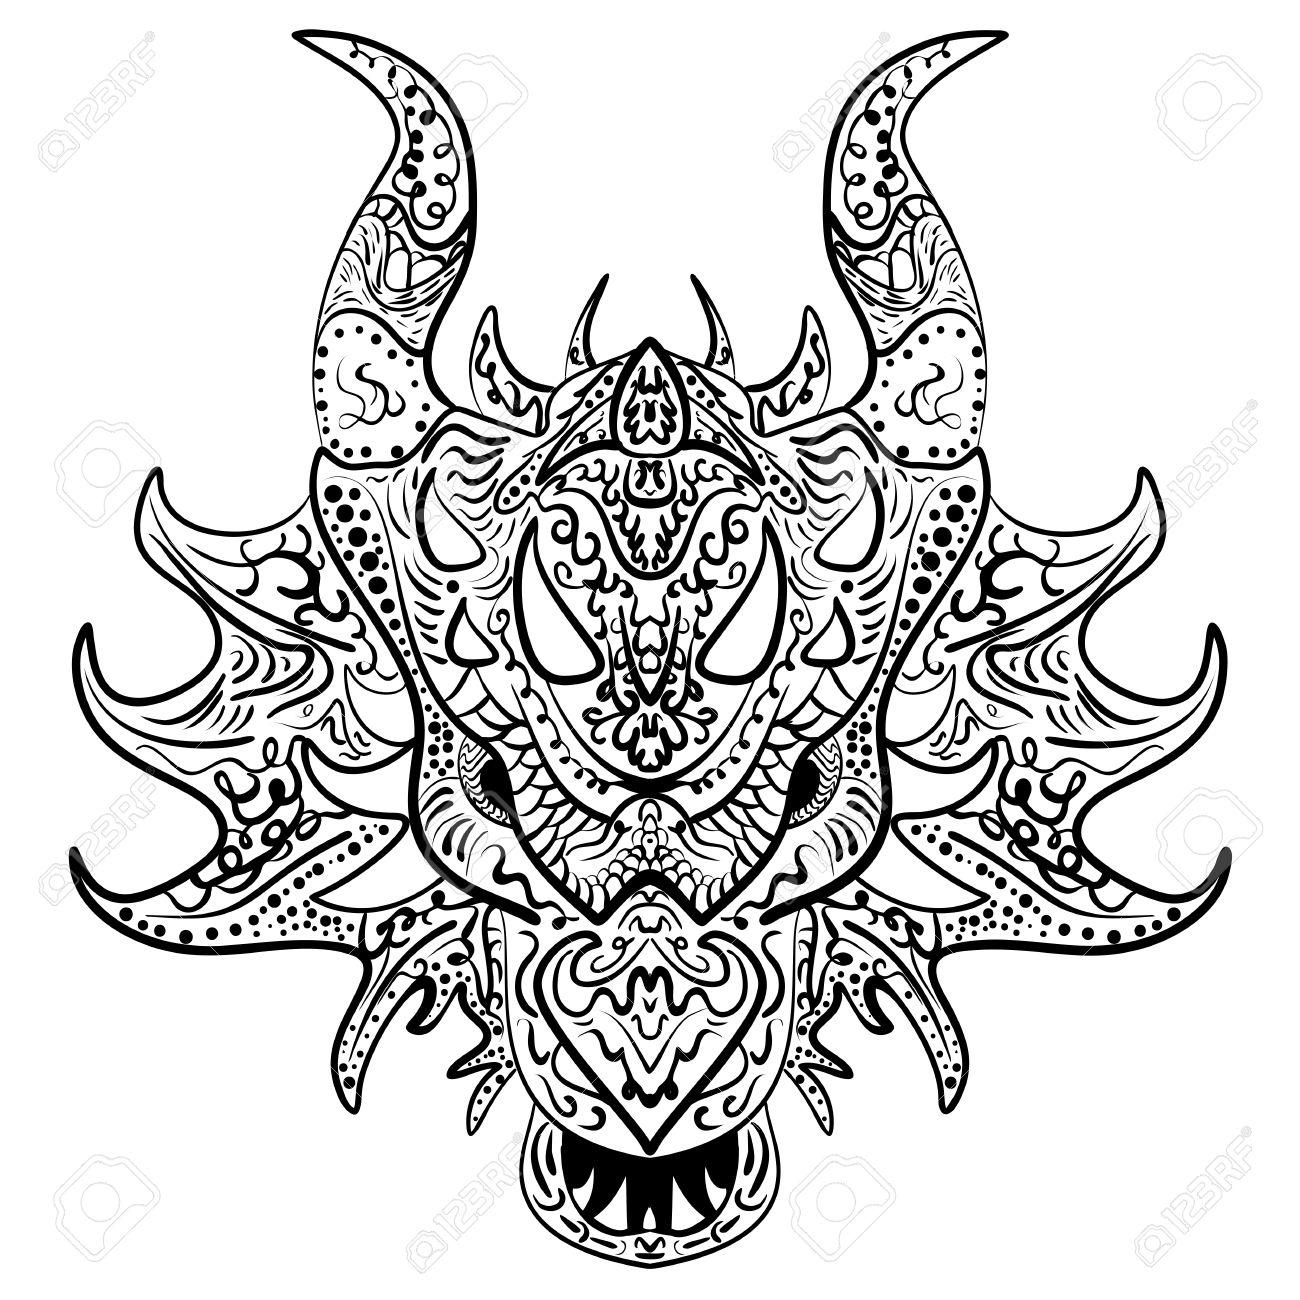 1300x1300 Dragon Doodle Vector Head. Zen Art Ethnic Drawing, Ornamental